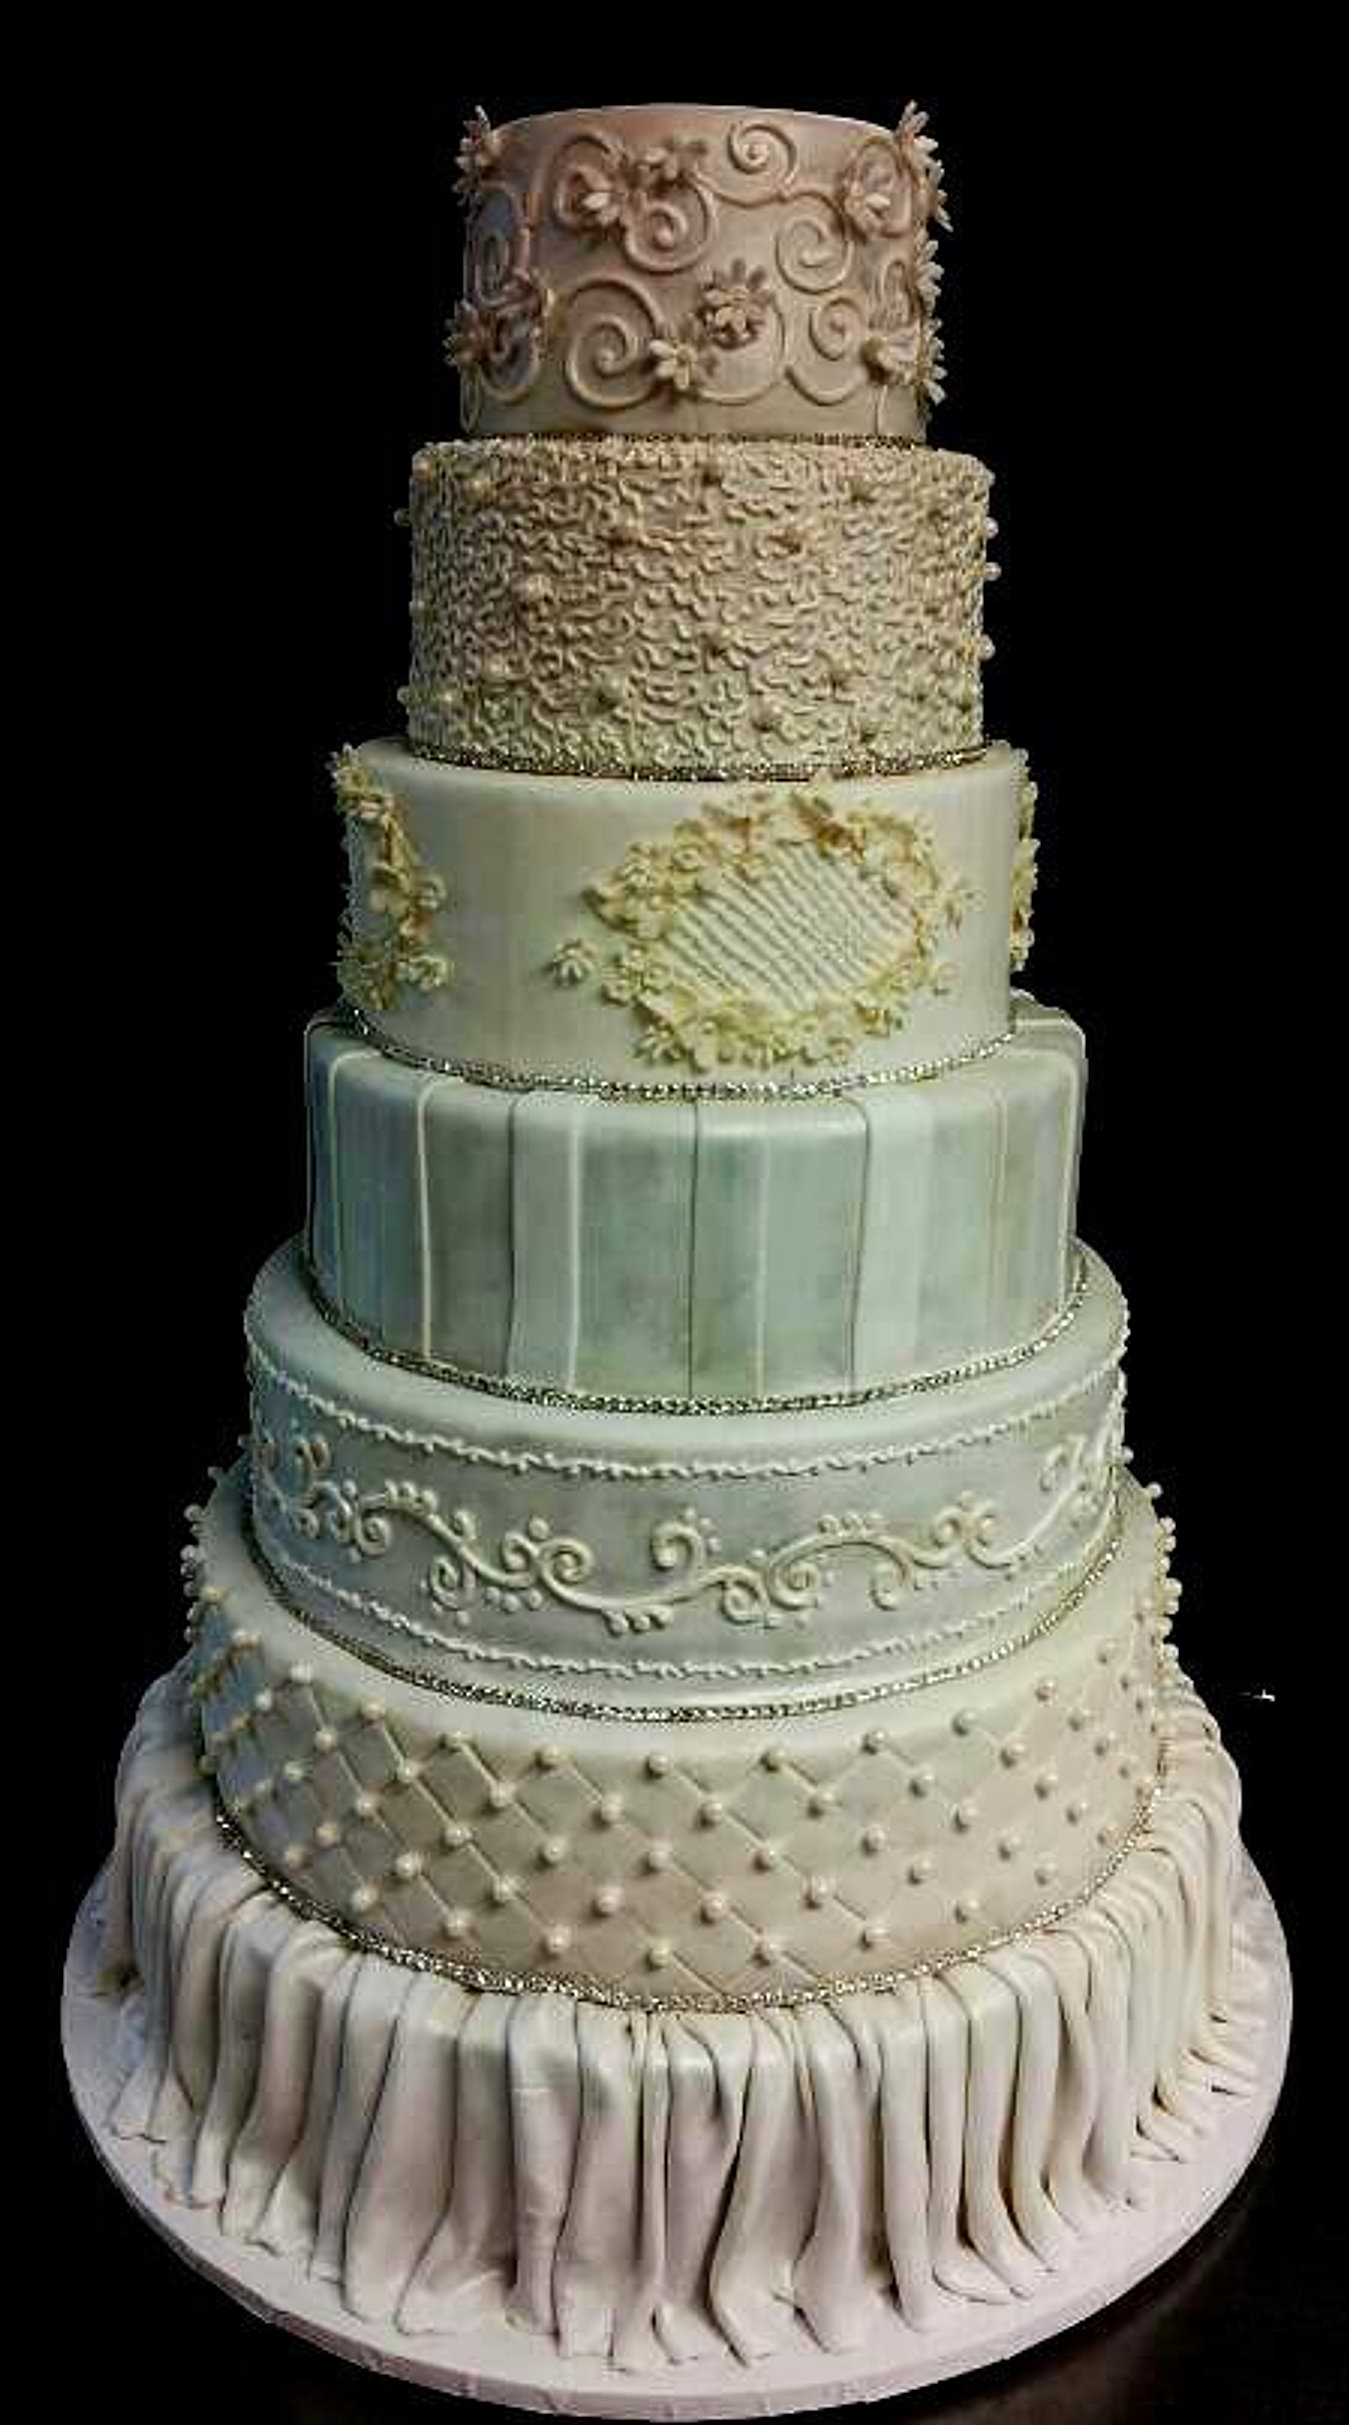 Wedding Cakes - Create Your Wedding Cake